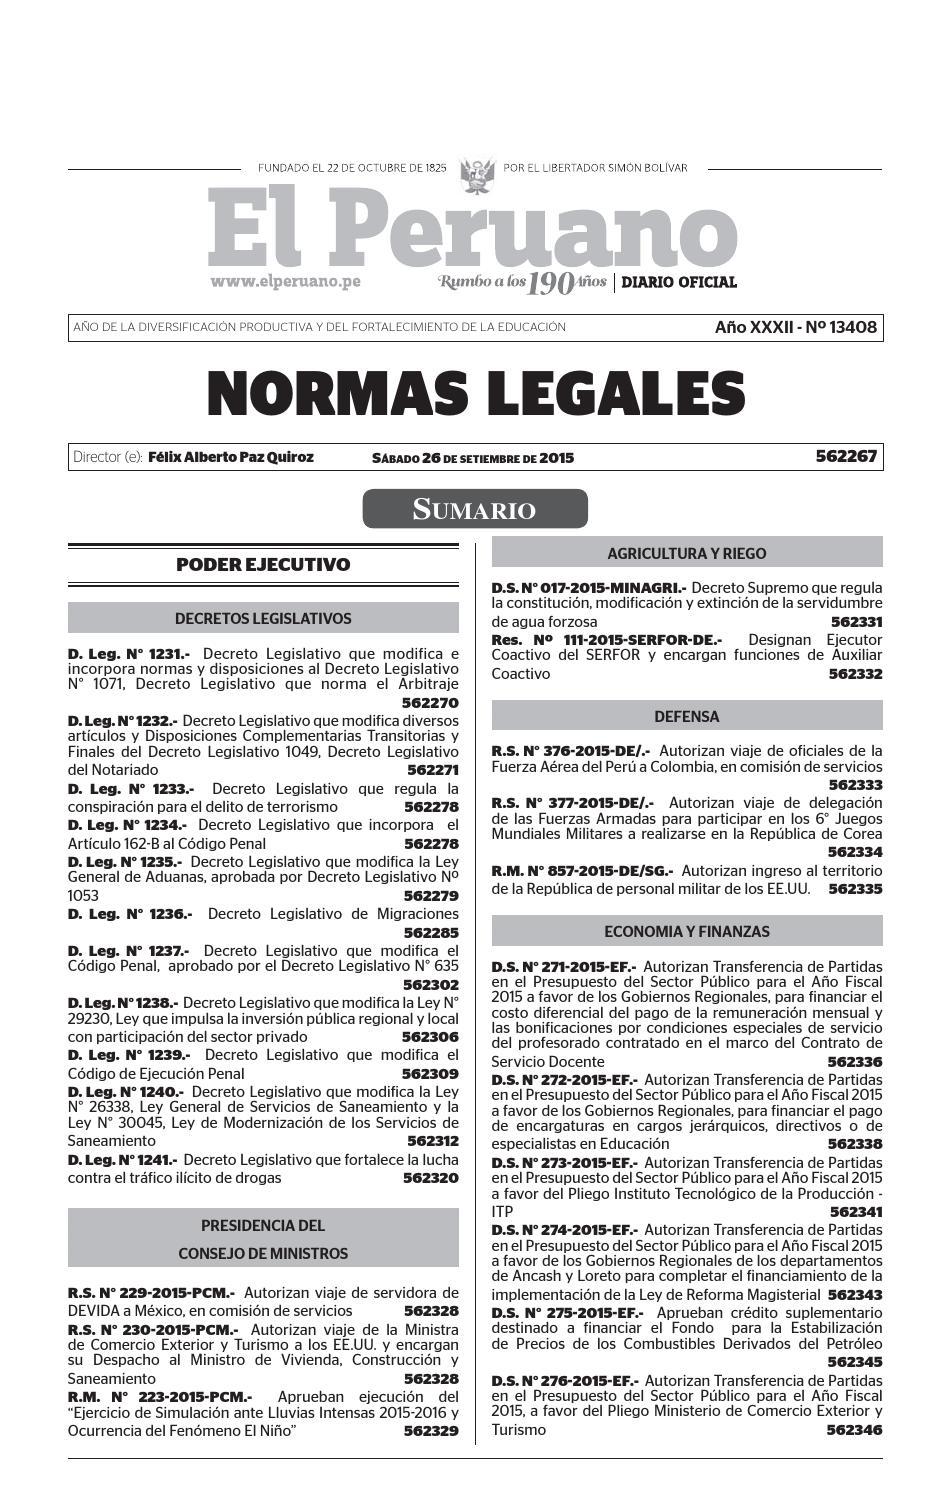 BOLETIN DEL DIARIO OFICIAL 26 09 2015 by Gaceta Juridica - issuu